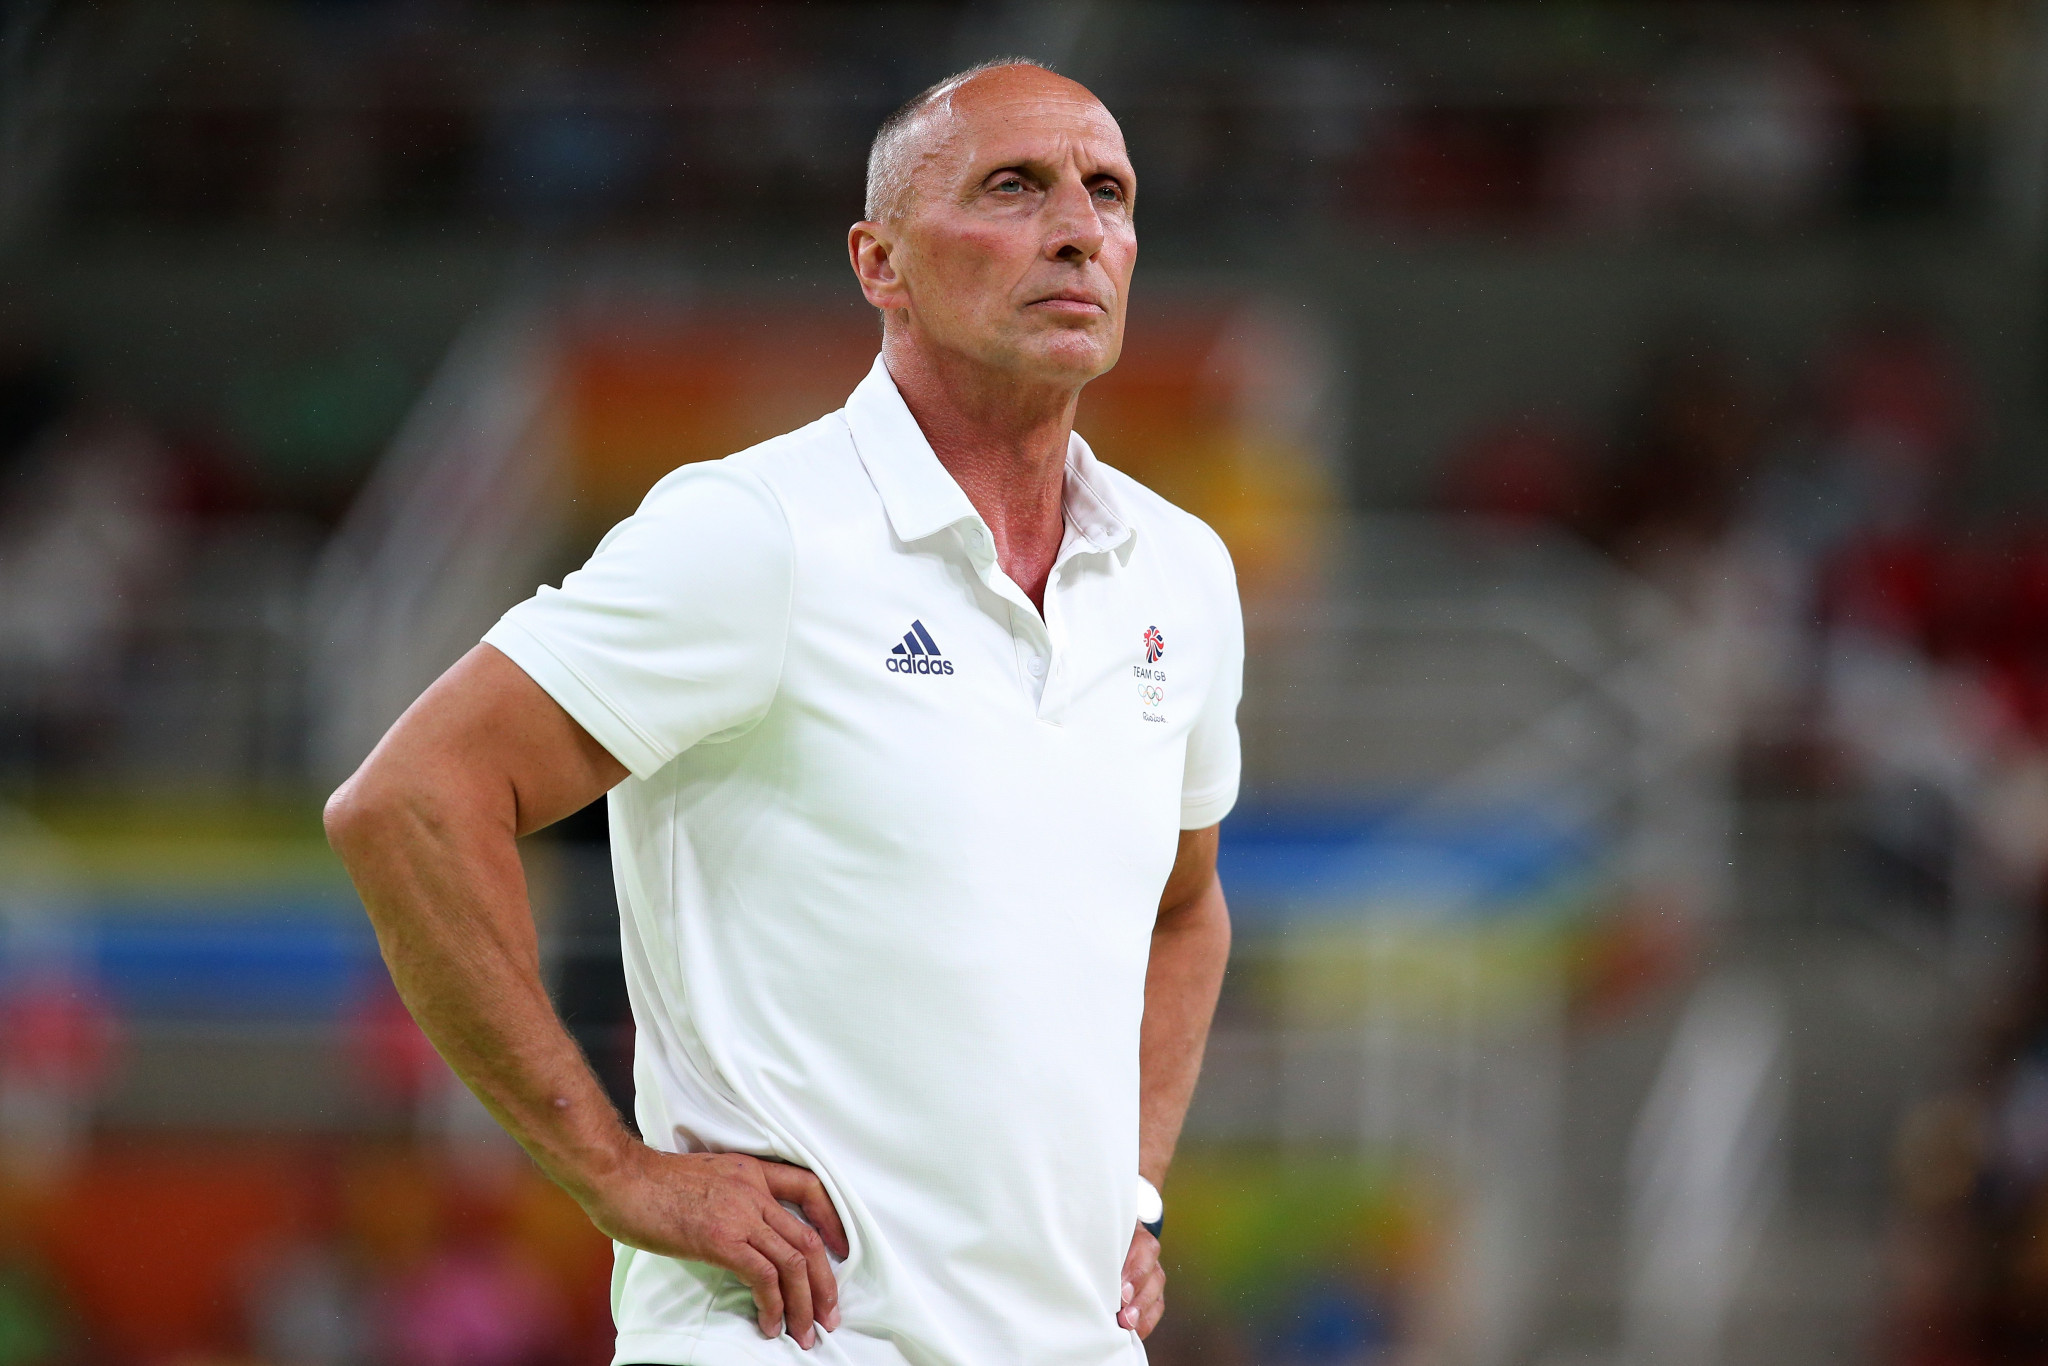 British Gymnastics sack men's head coach after investigation